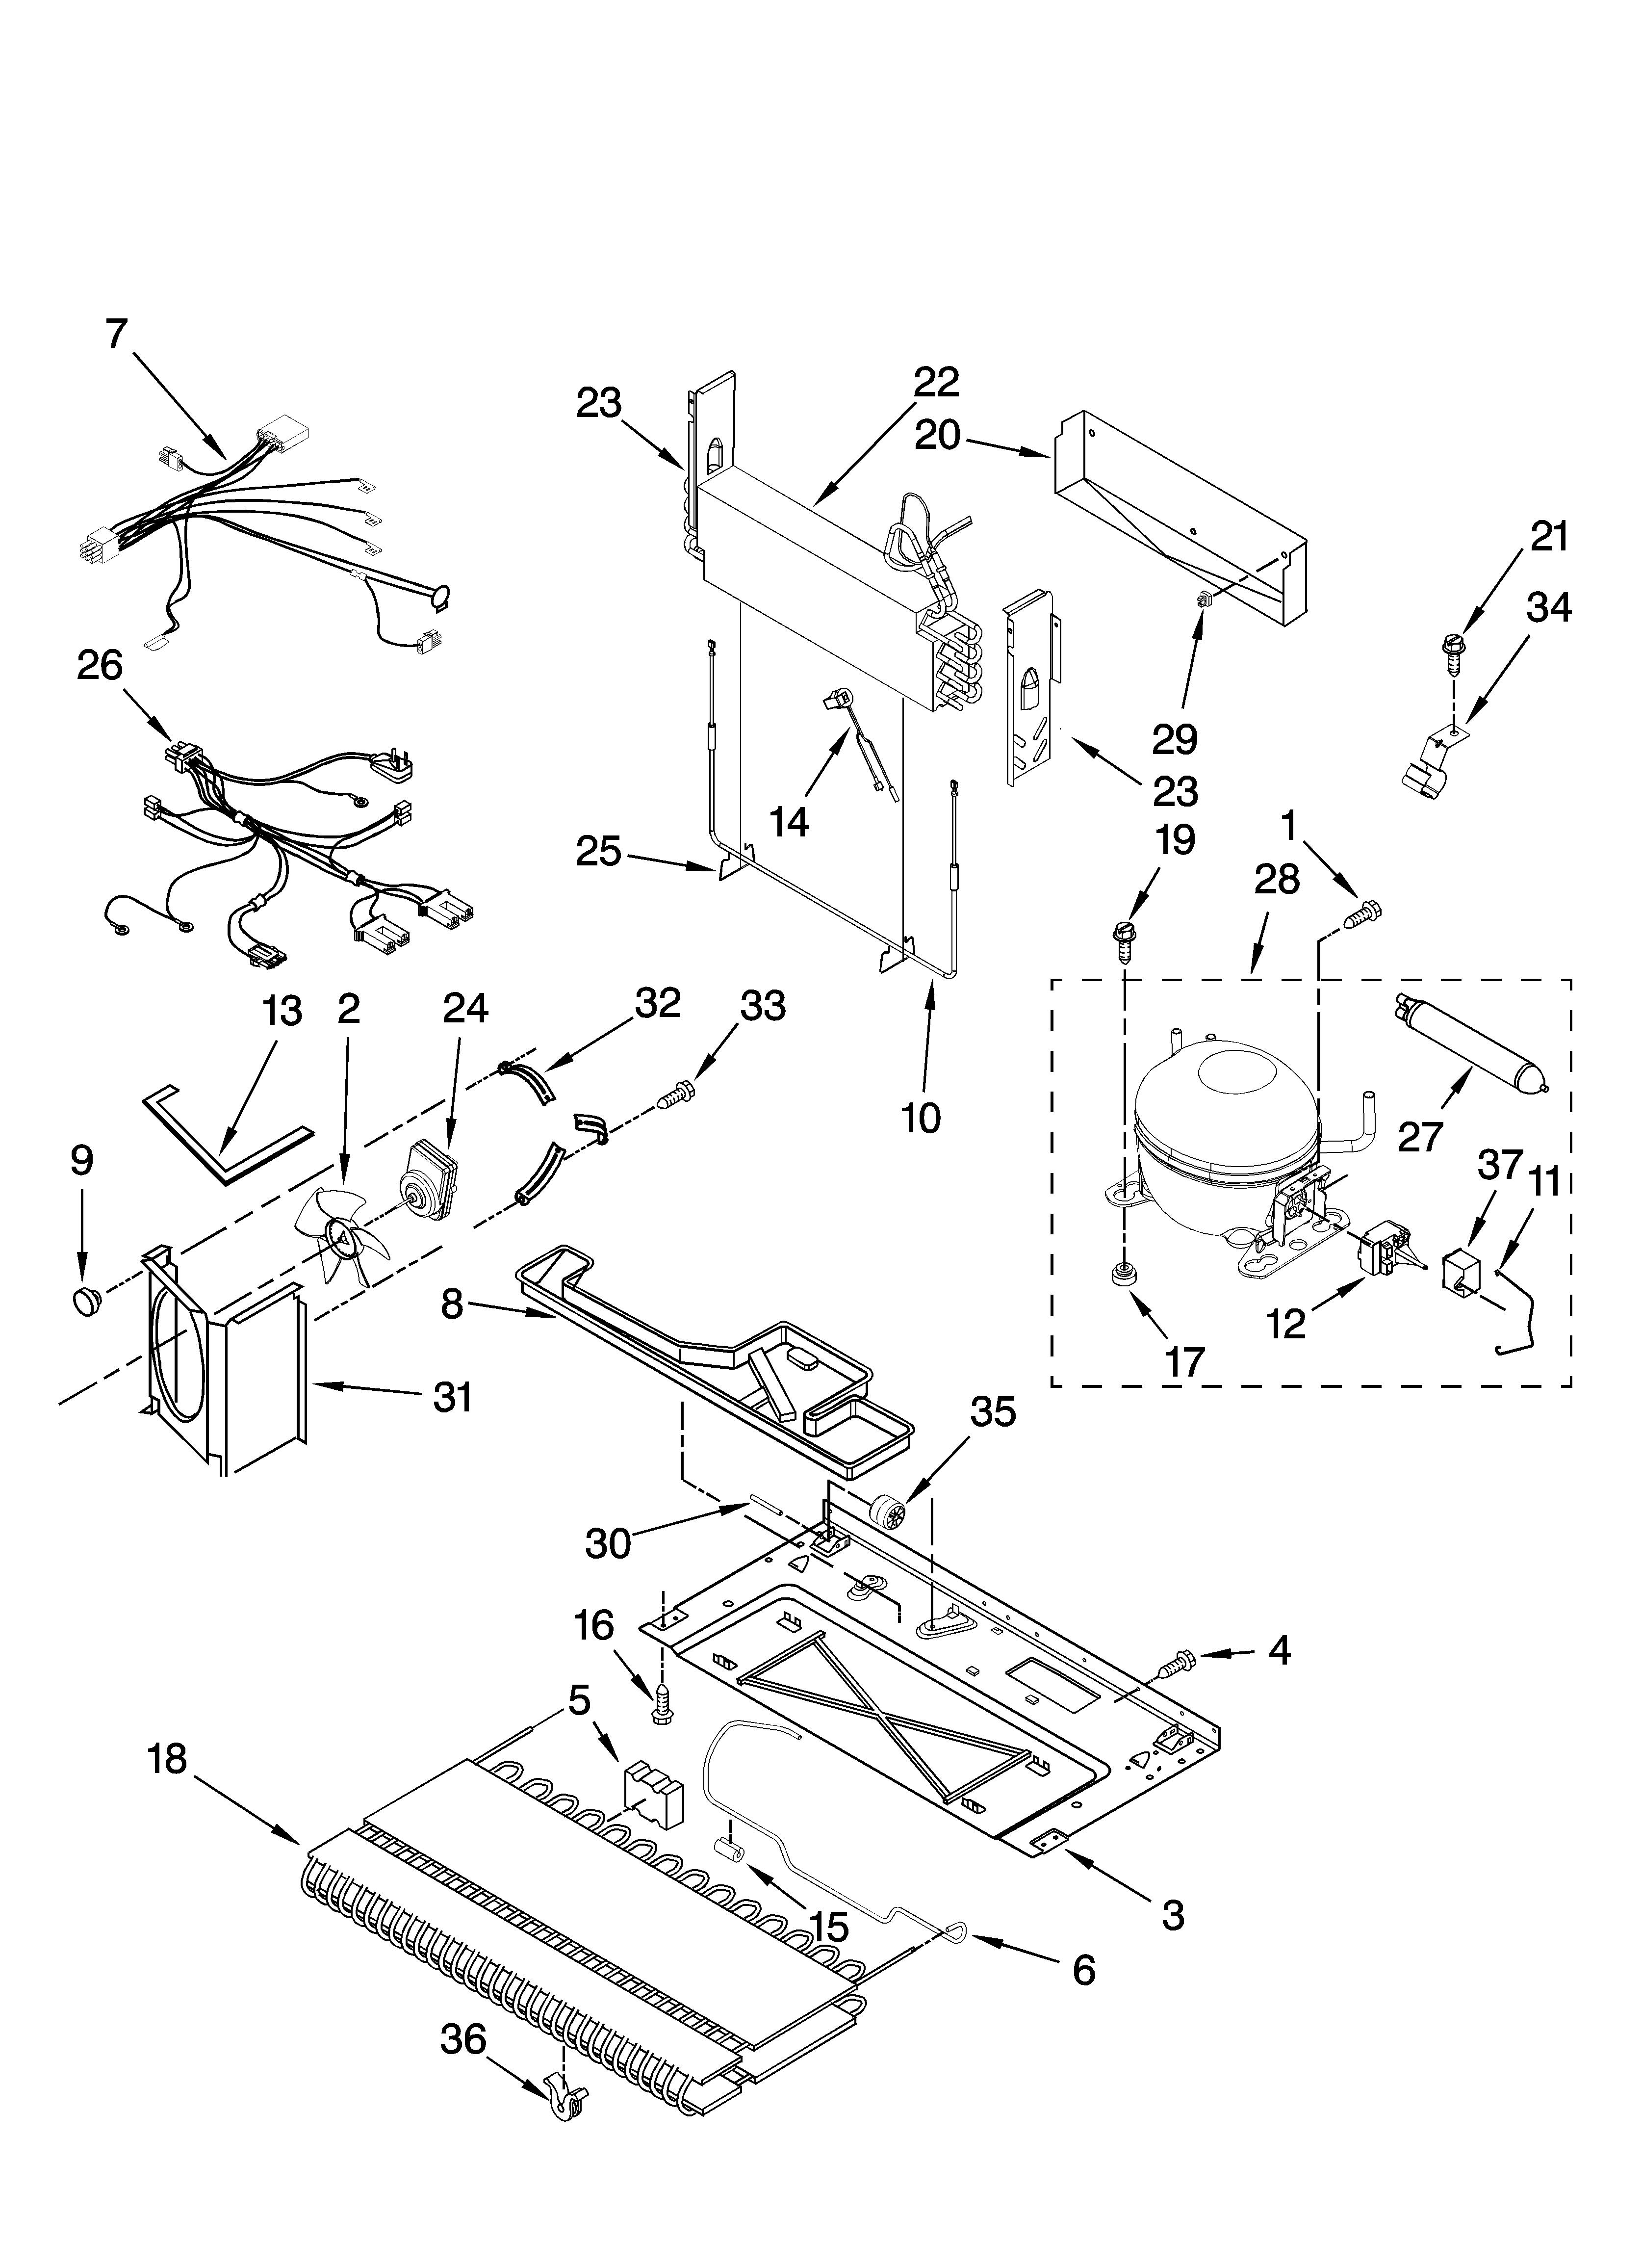 pss26 ge refrigerator wiring diagram